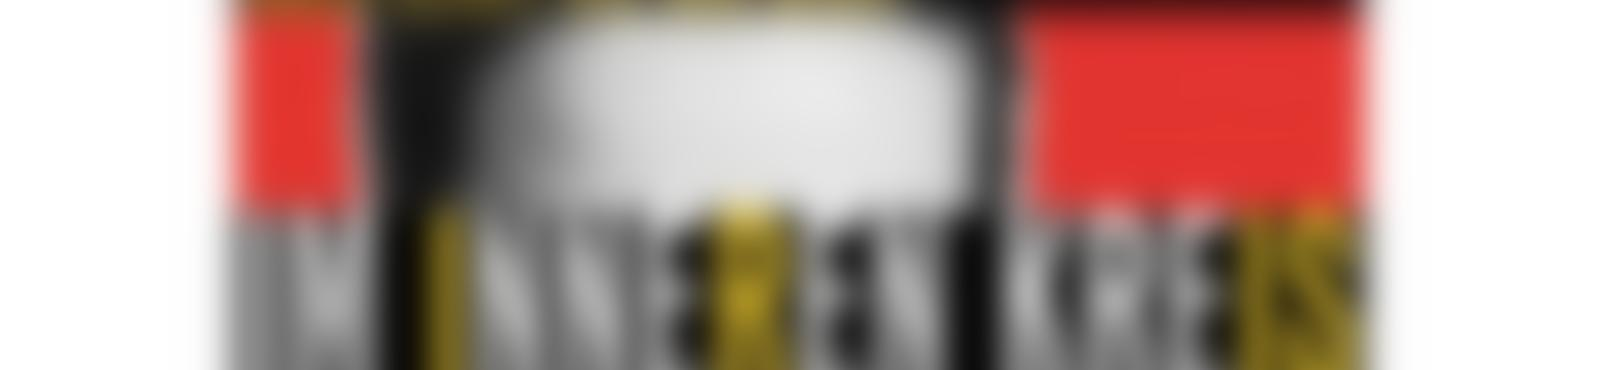 Blurred cd952ea1 d882 48e0 9ff0 54c10204e240